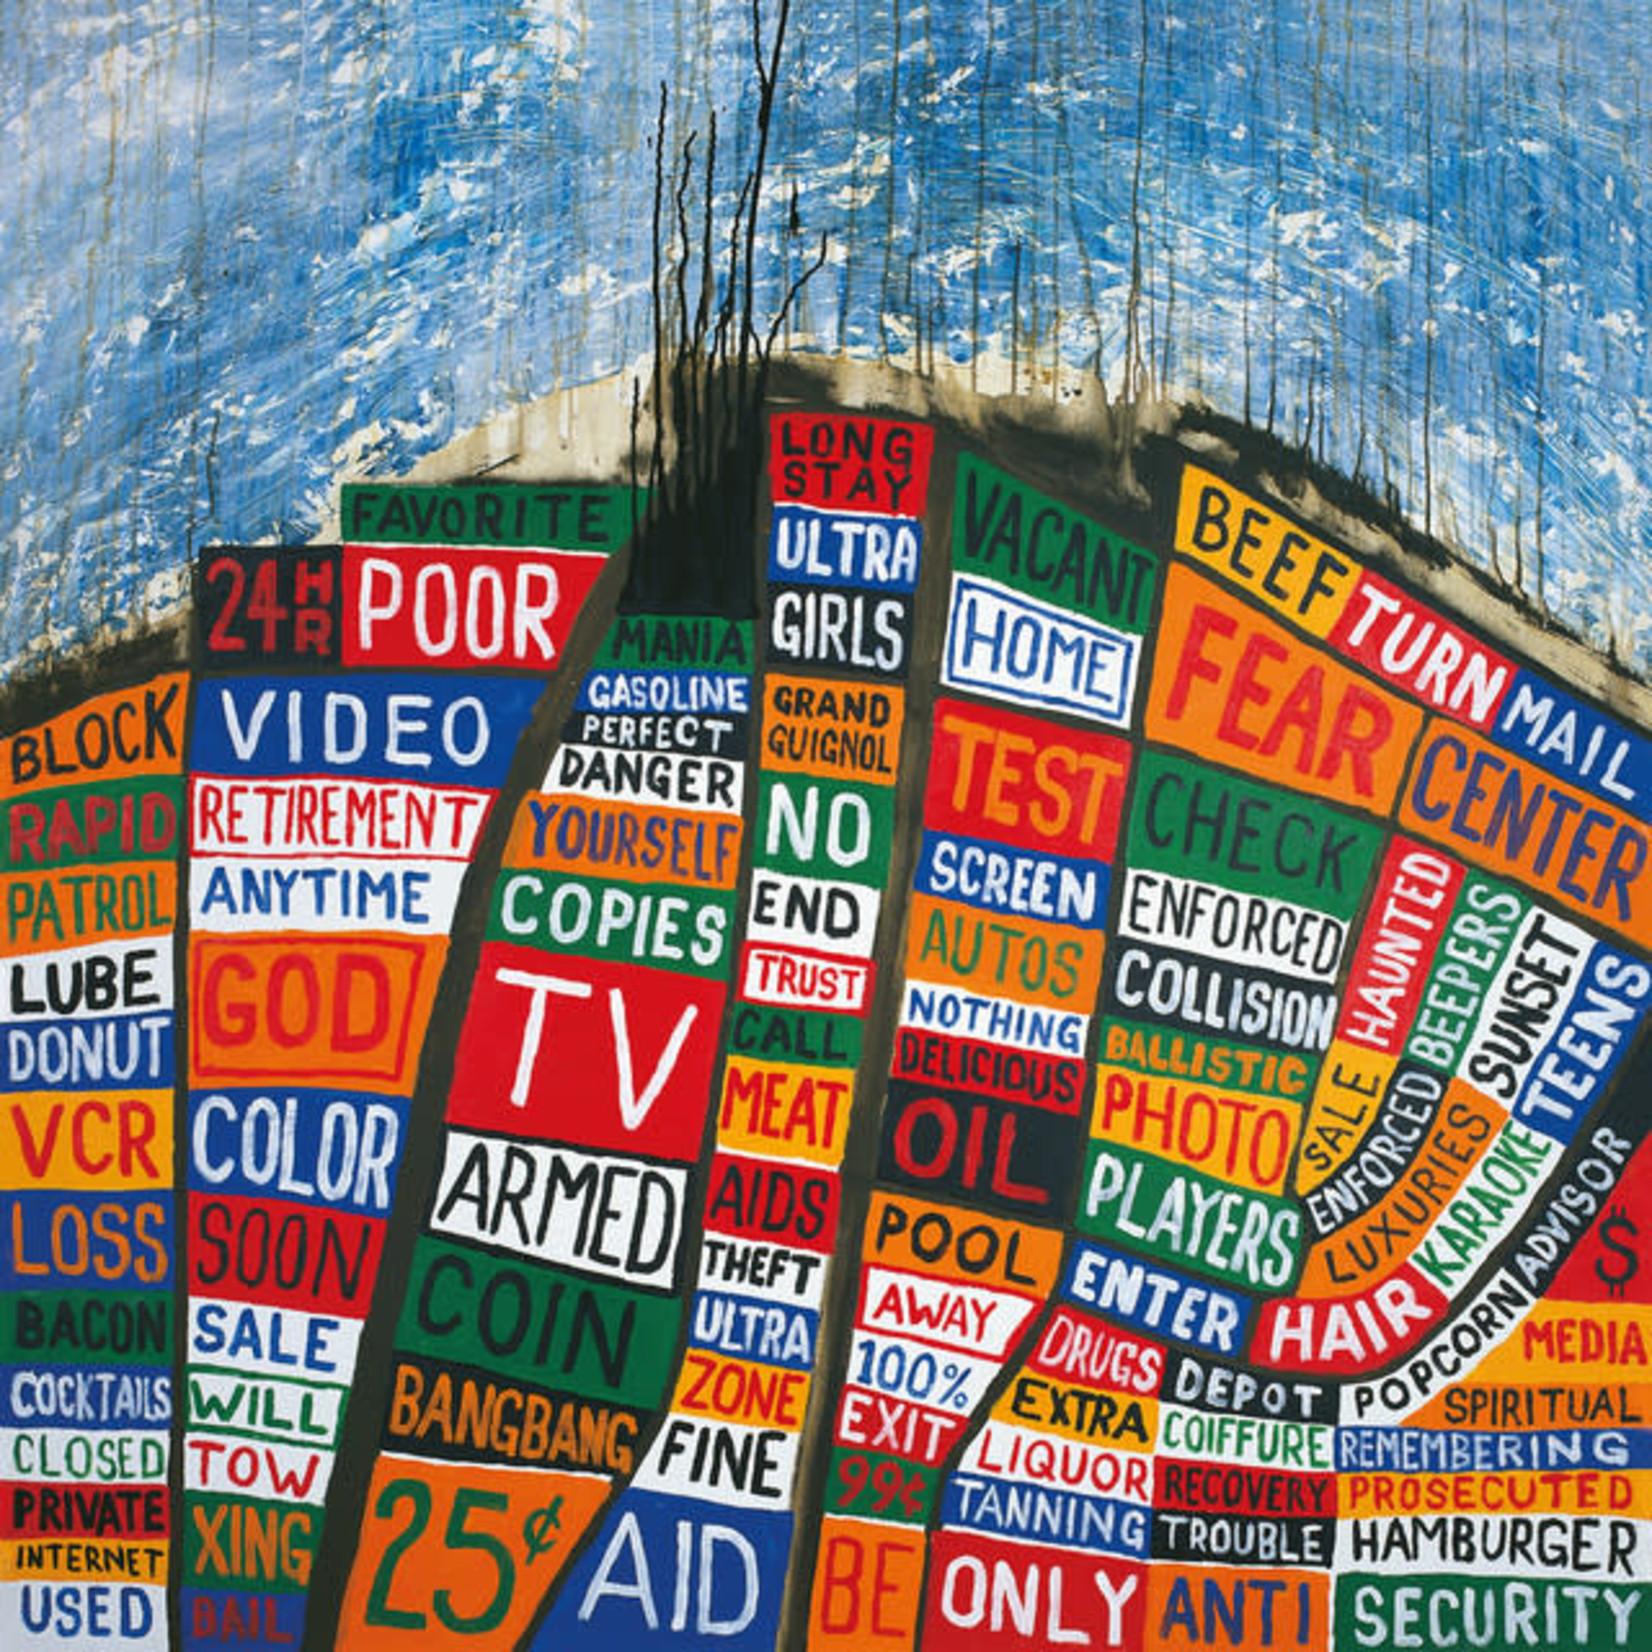 Vinyl Radiohead - Hail To The Thief